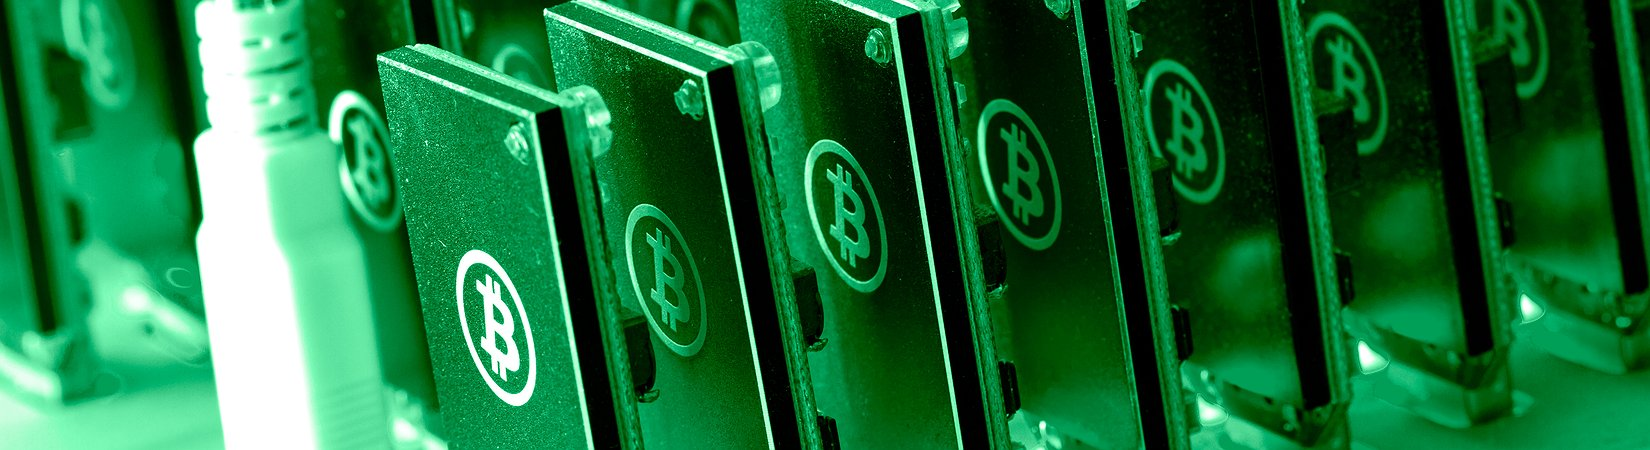 Blockchain & Bitcoin Conference приглашает на выставку криптоиндустрии